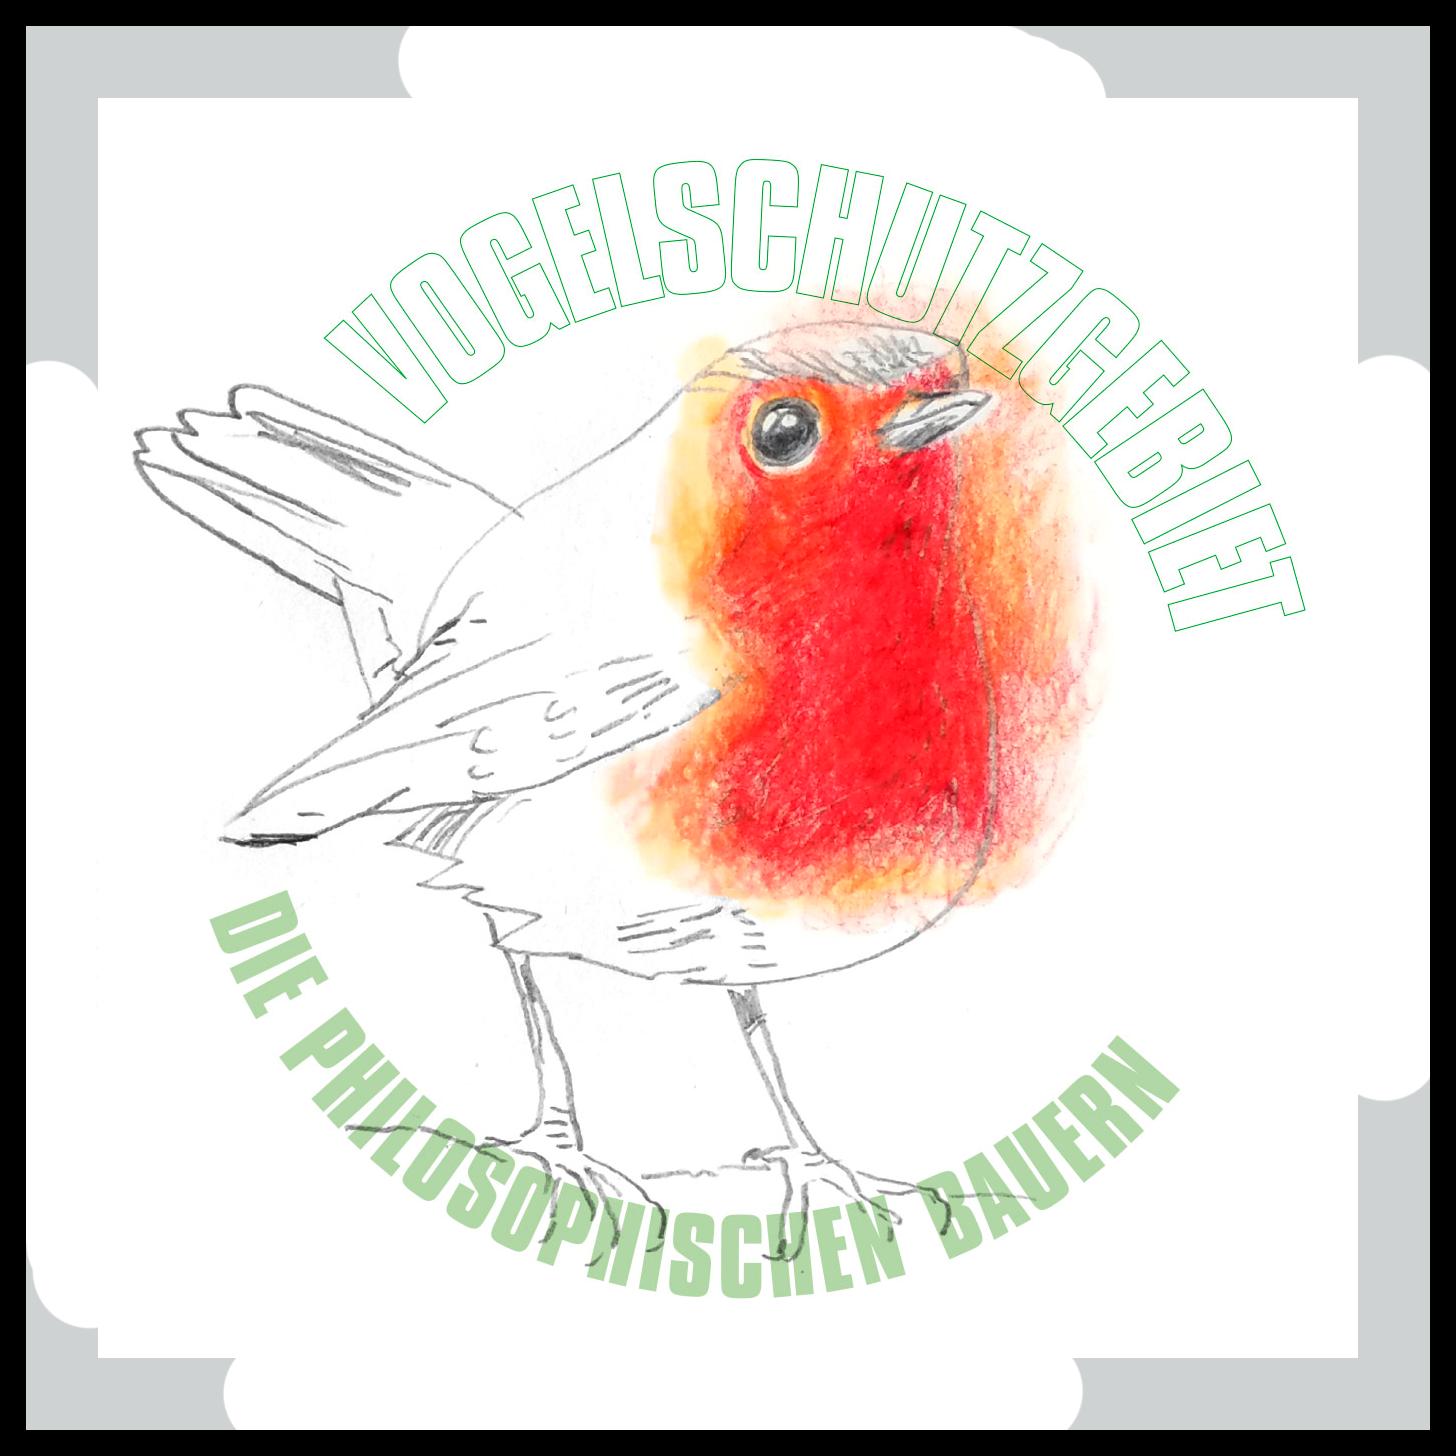 Vogel des Jahres 2021: Erithacus rubecula